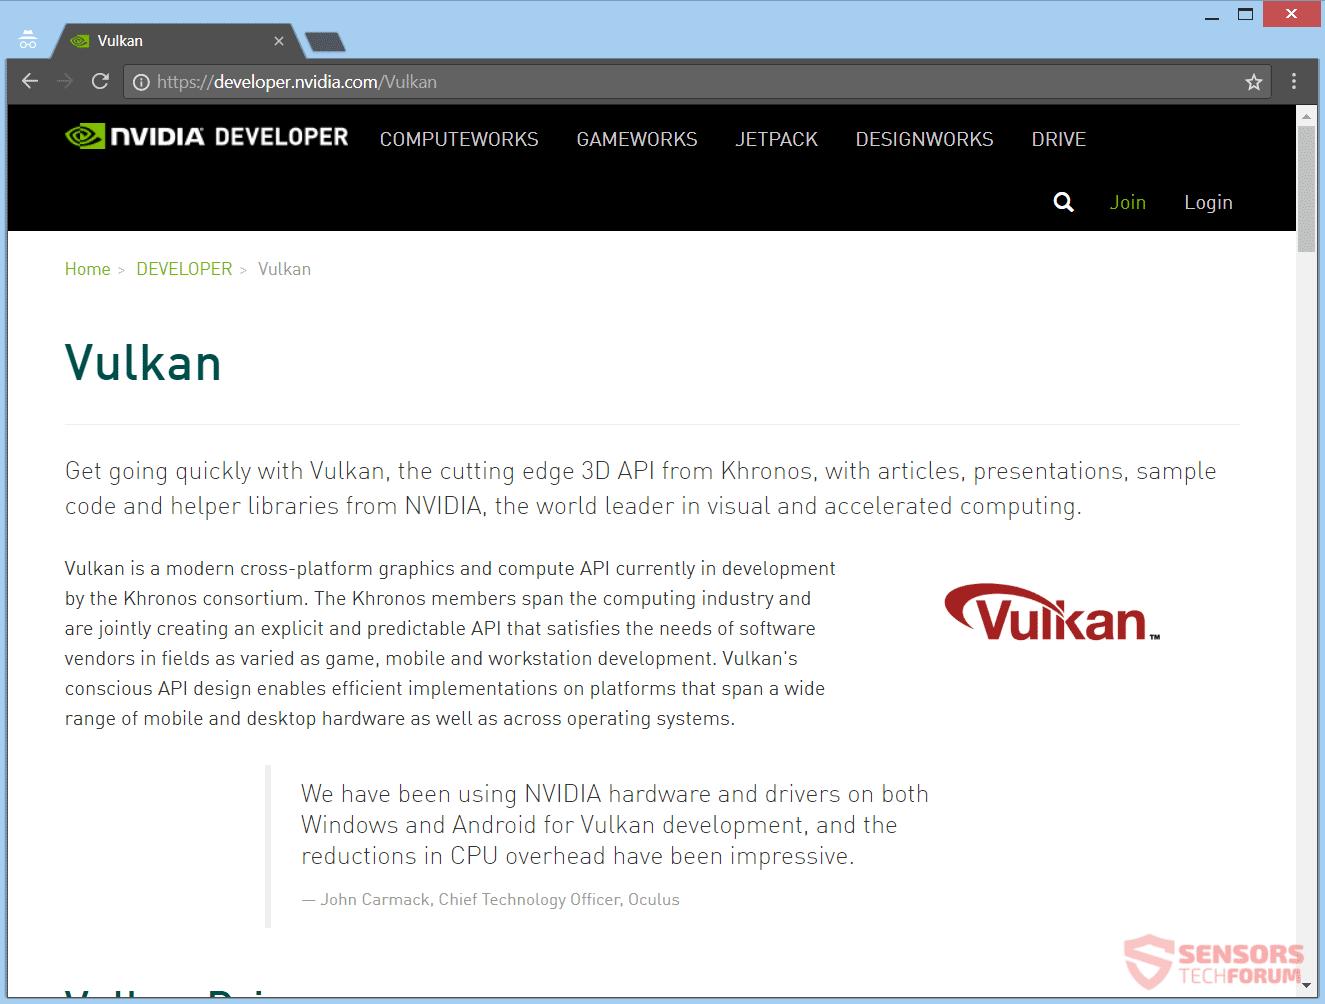 VulkanInfo32 exe – Is It Malware?